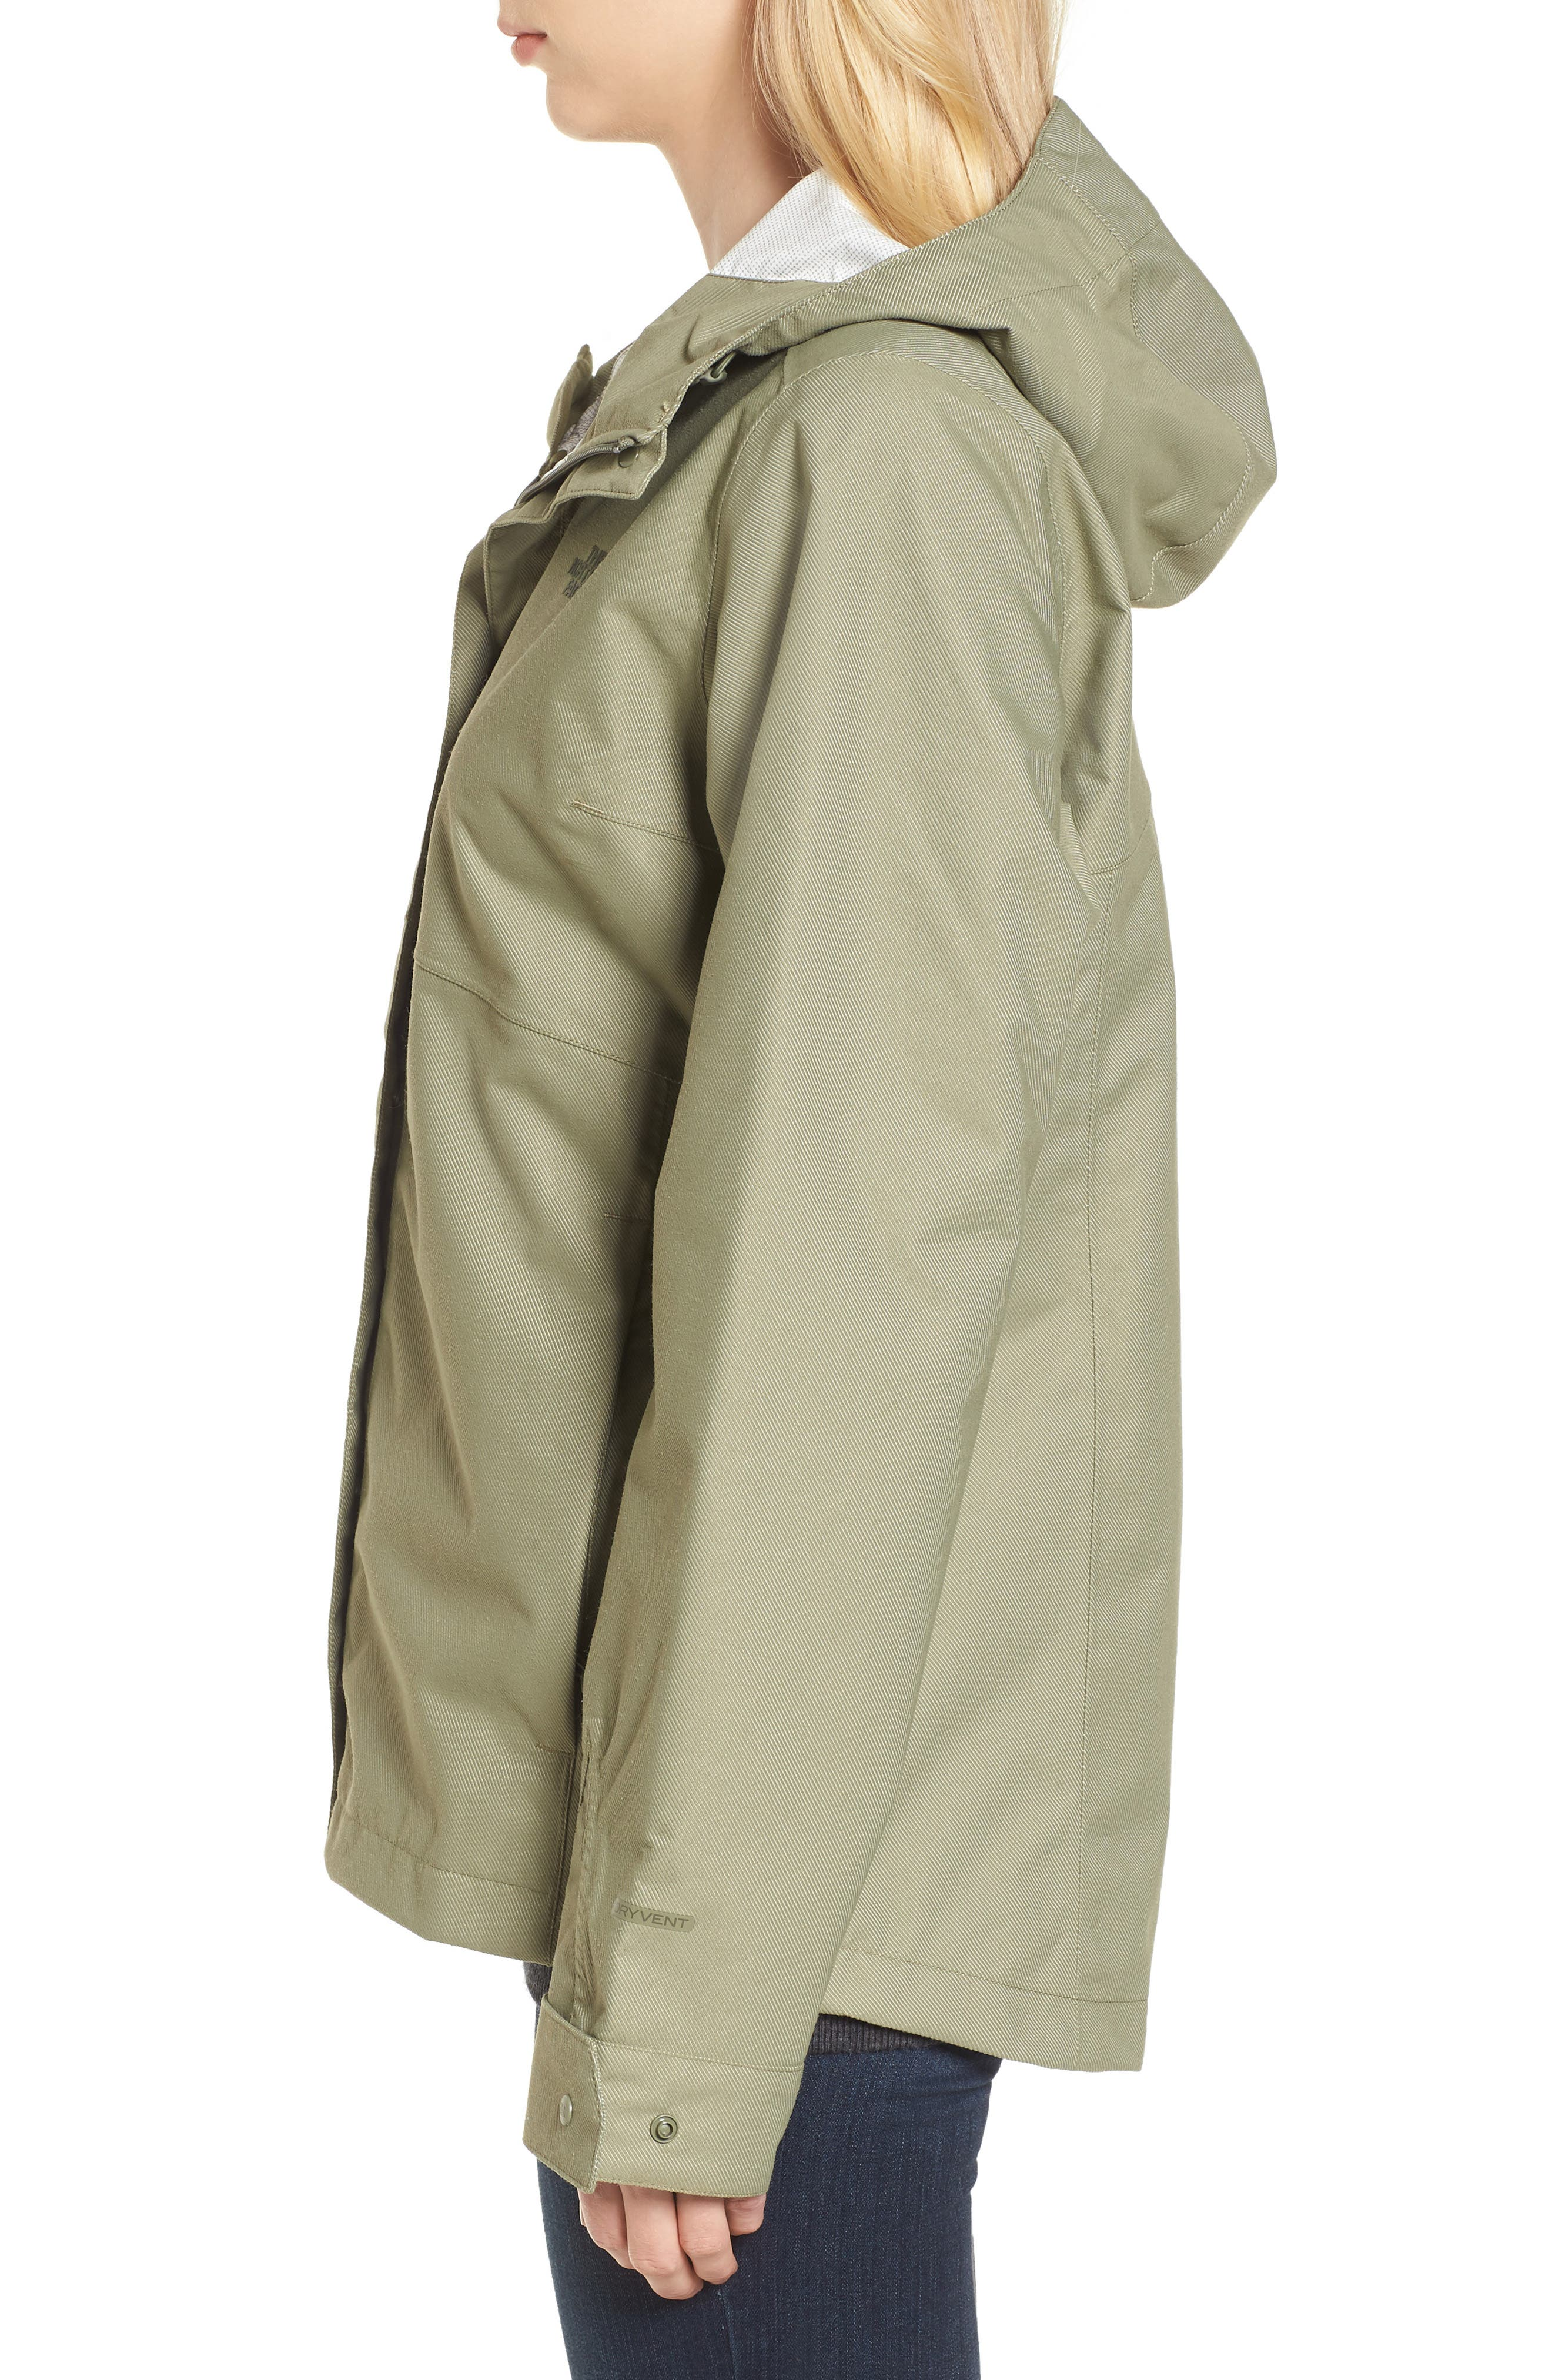 Berrien Waterproof Jacket,                             Alternate thumbnail 3, color,                             Deep Lichen Green Denim